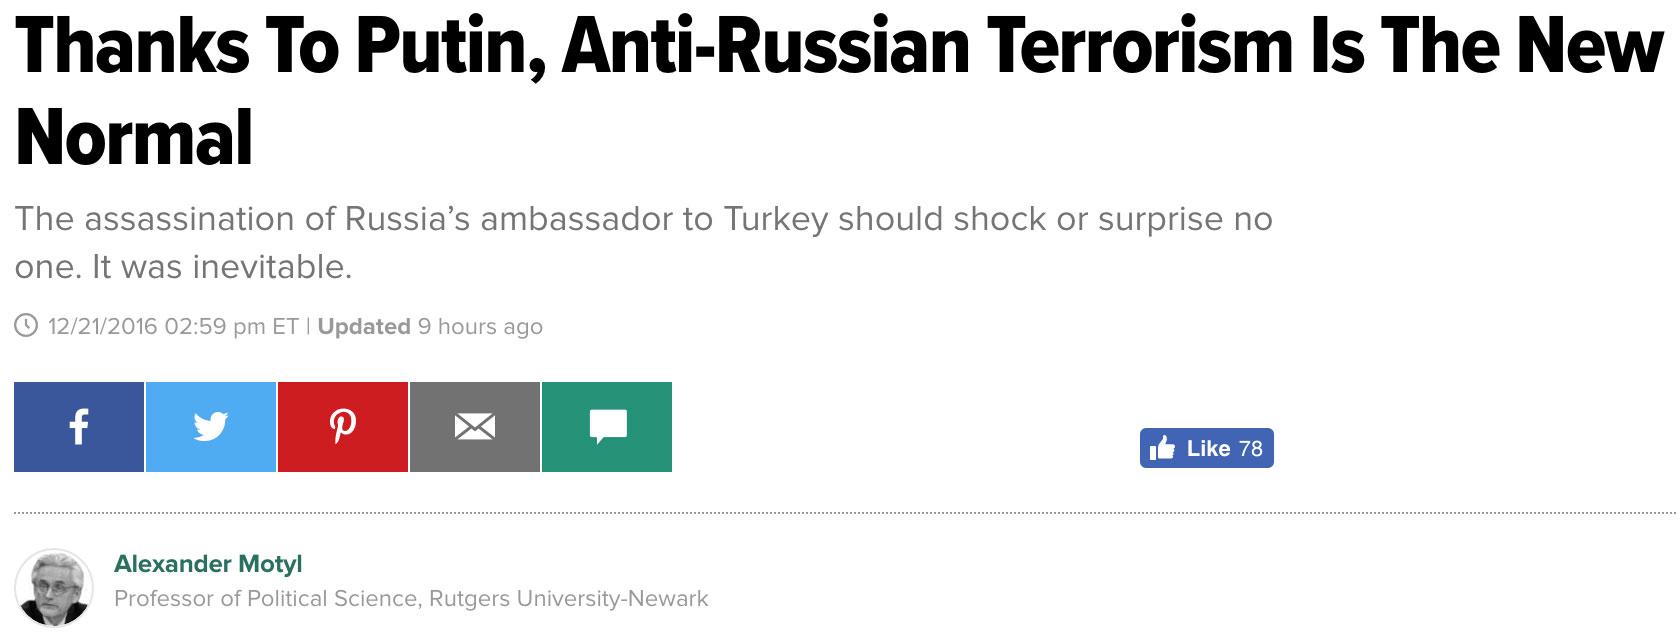 putin-anti-russian-terrorism